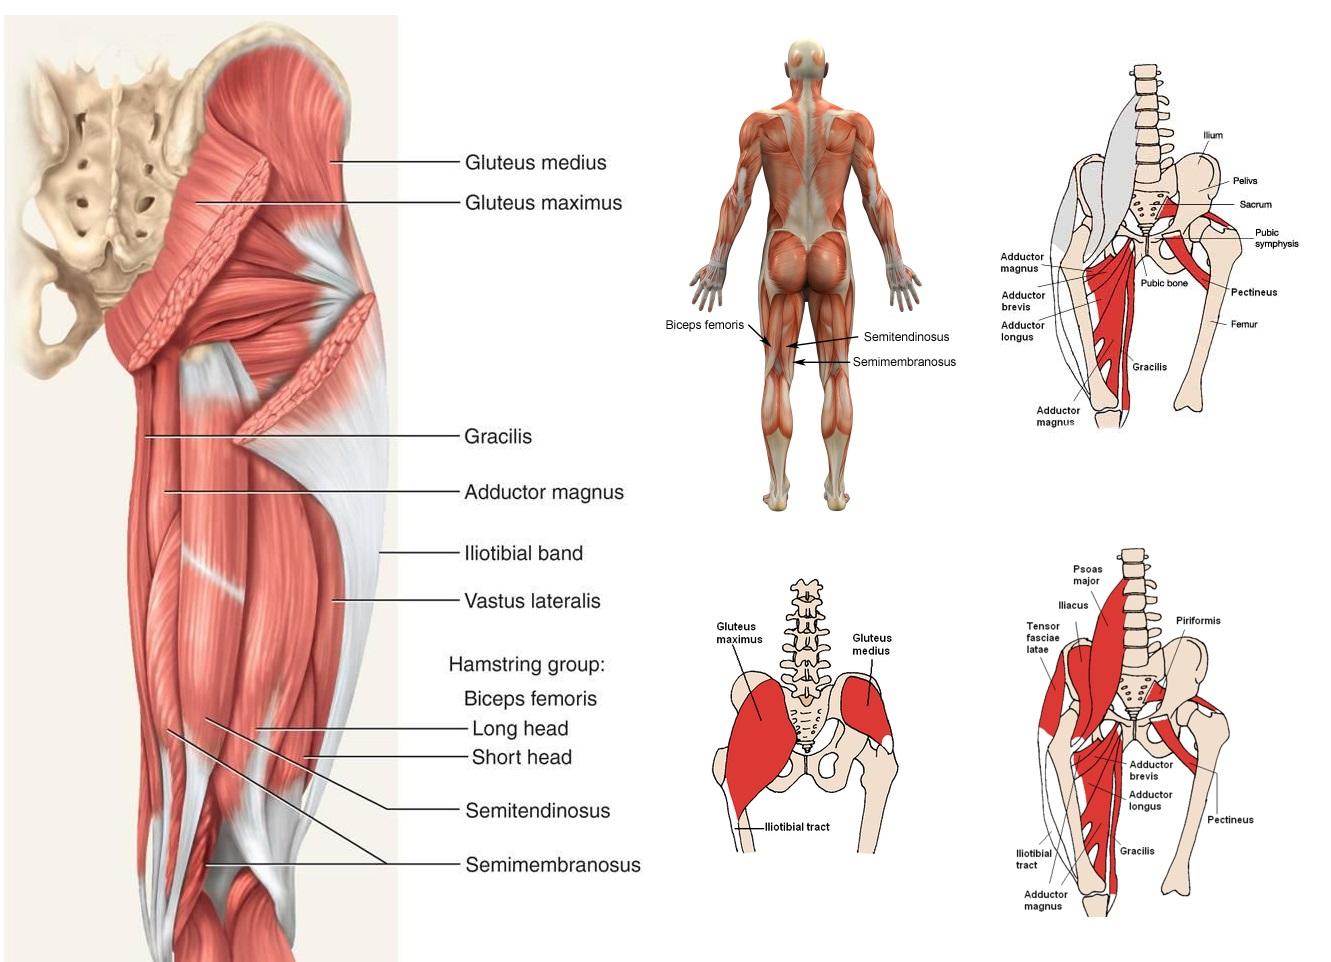 hip anatomy image 2